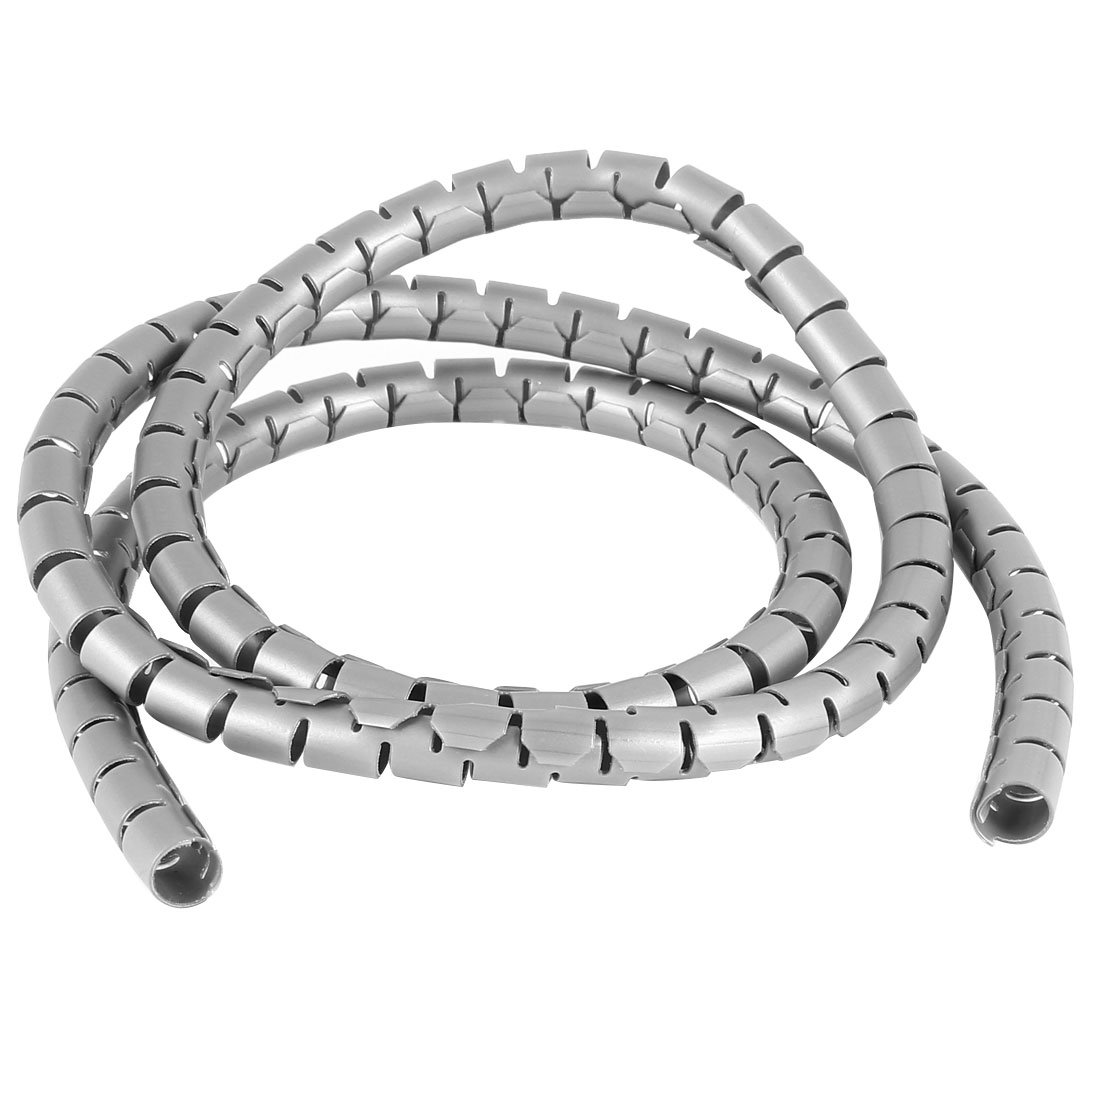 Amazon.de: 1 m, grau, Cord, verwalten, Spiral-Draht-Ummantelung